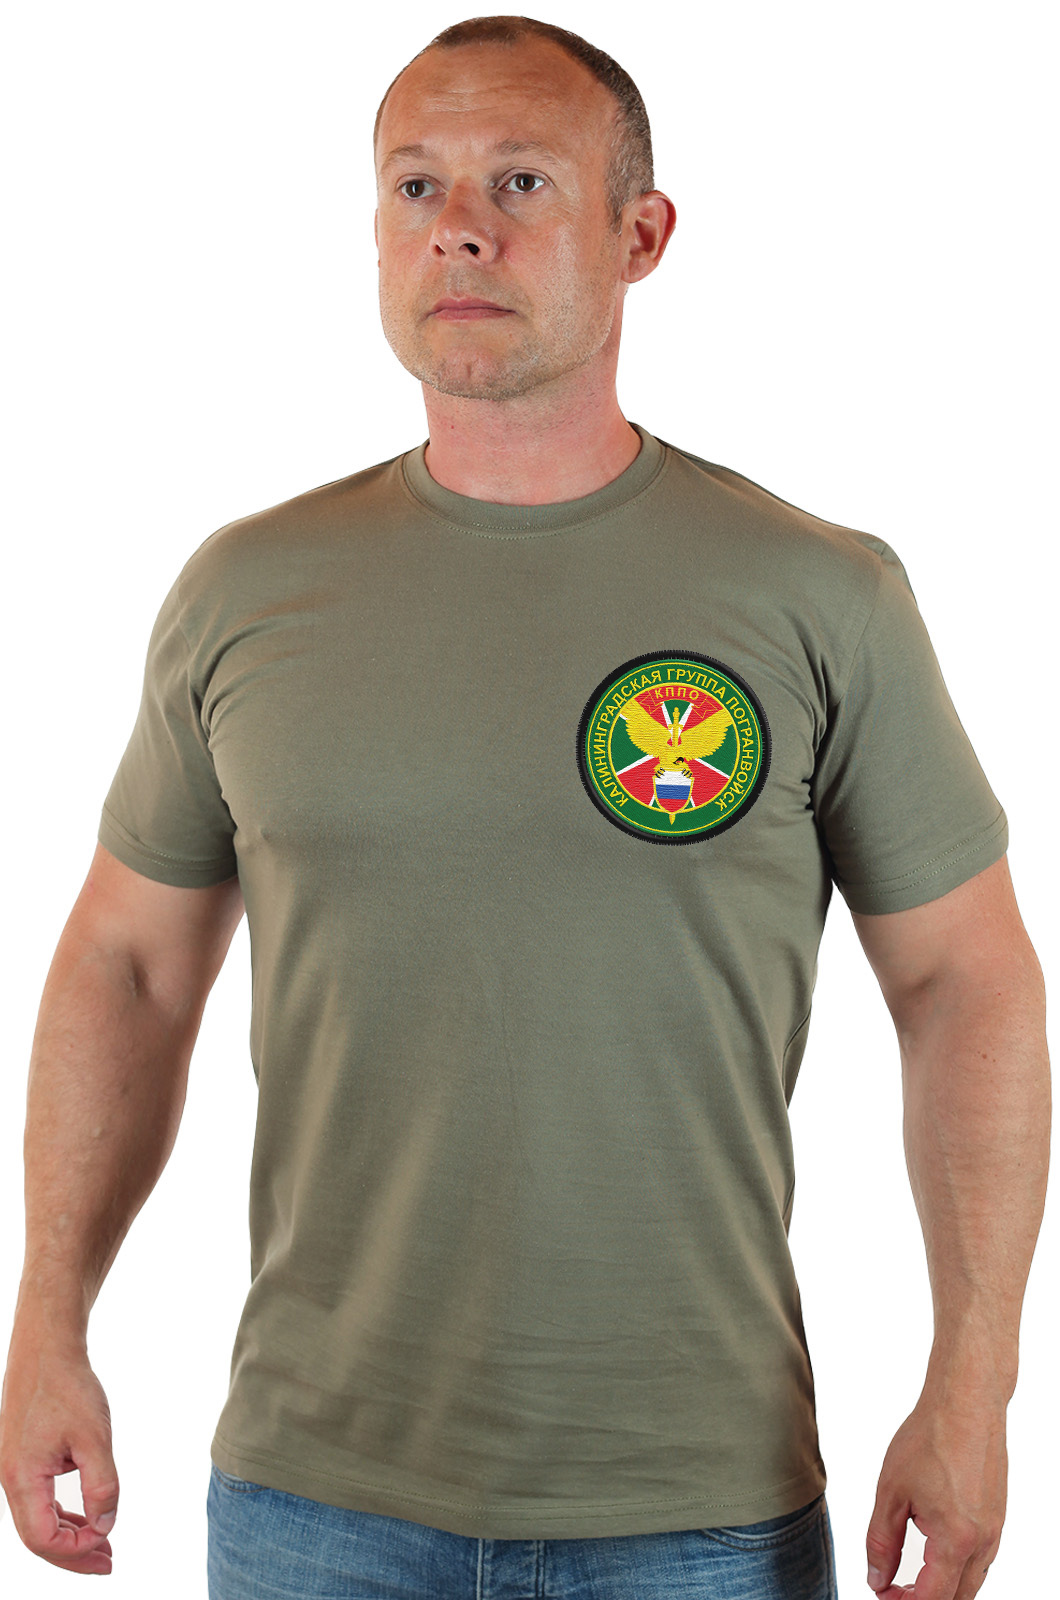 Купить футболку погранвойск в военторге Военпро